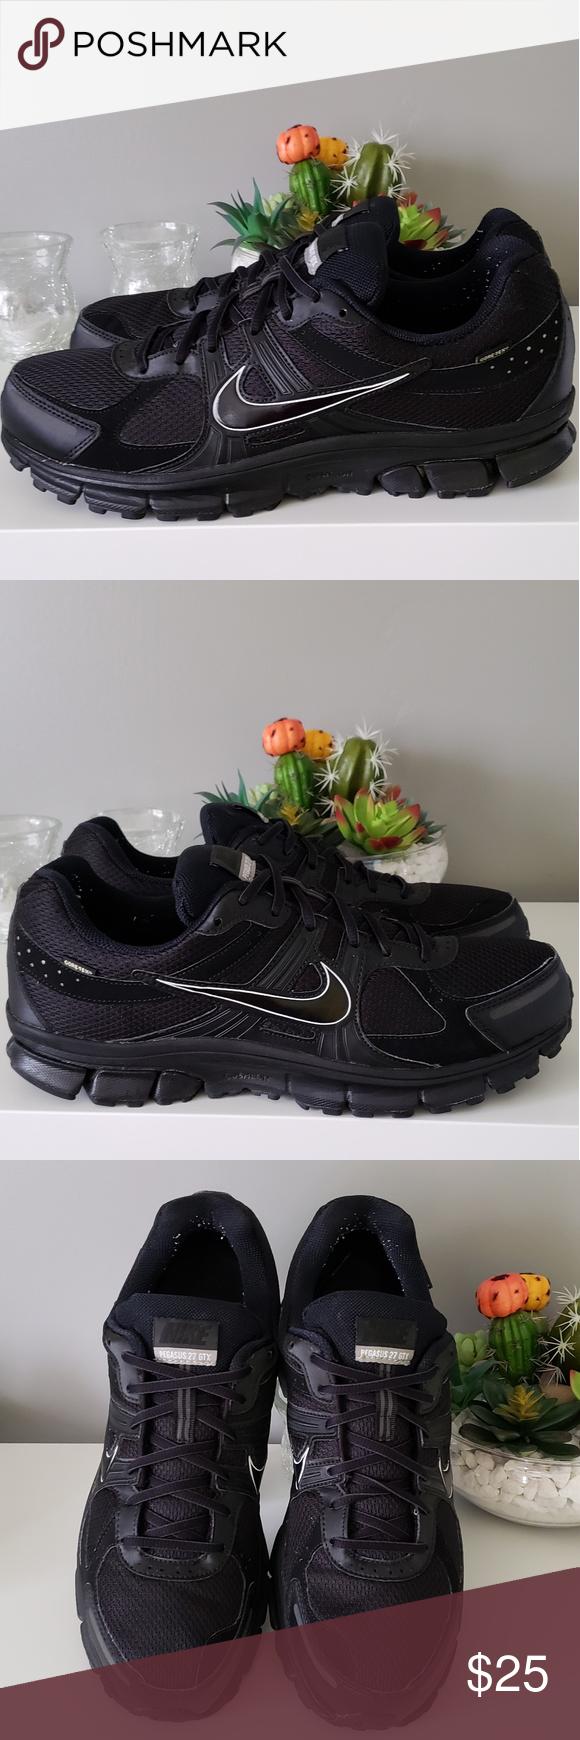 b87599b2e249 nike air pegasus 27 FTC size 13 like new Nike Shoes Athletic Shoes